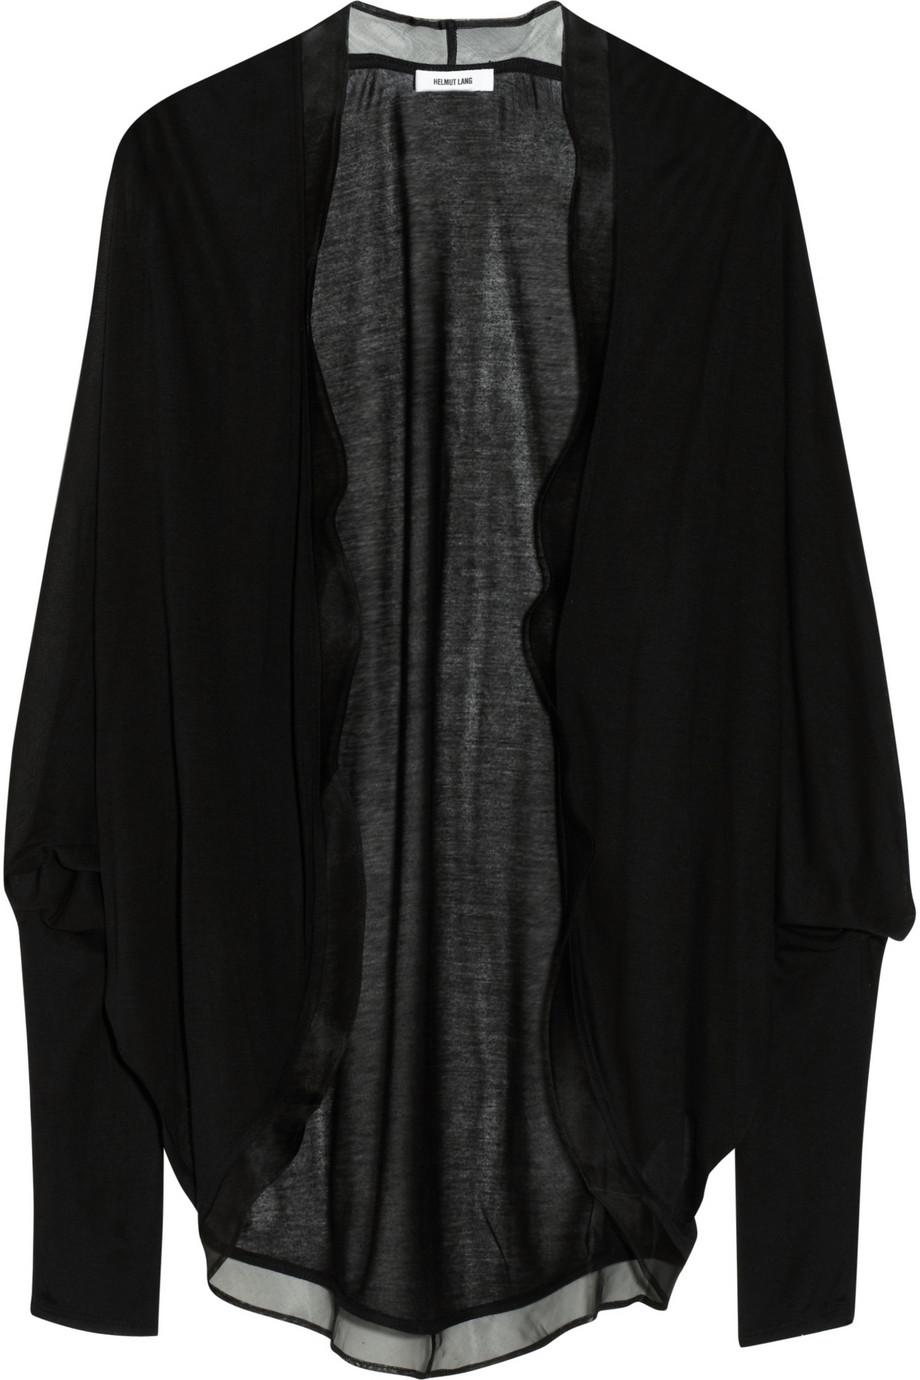 Helmut lang Silk Chiffon trimmed Jersey Cardigan in Black | Lyst